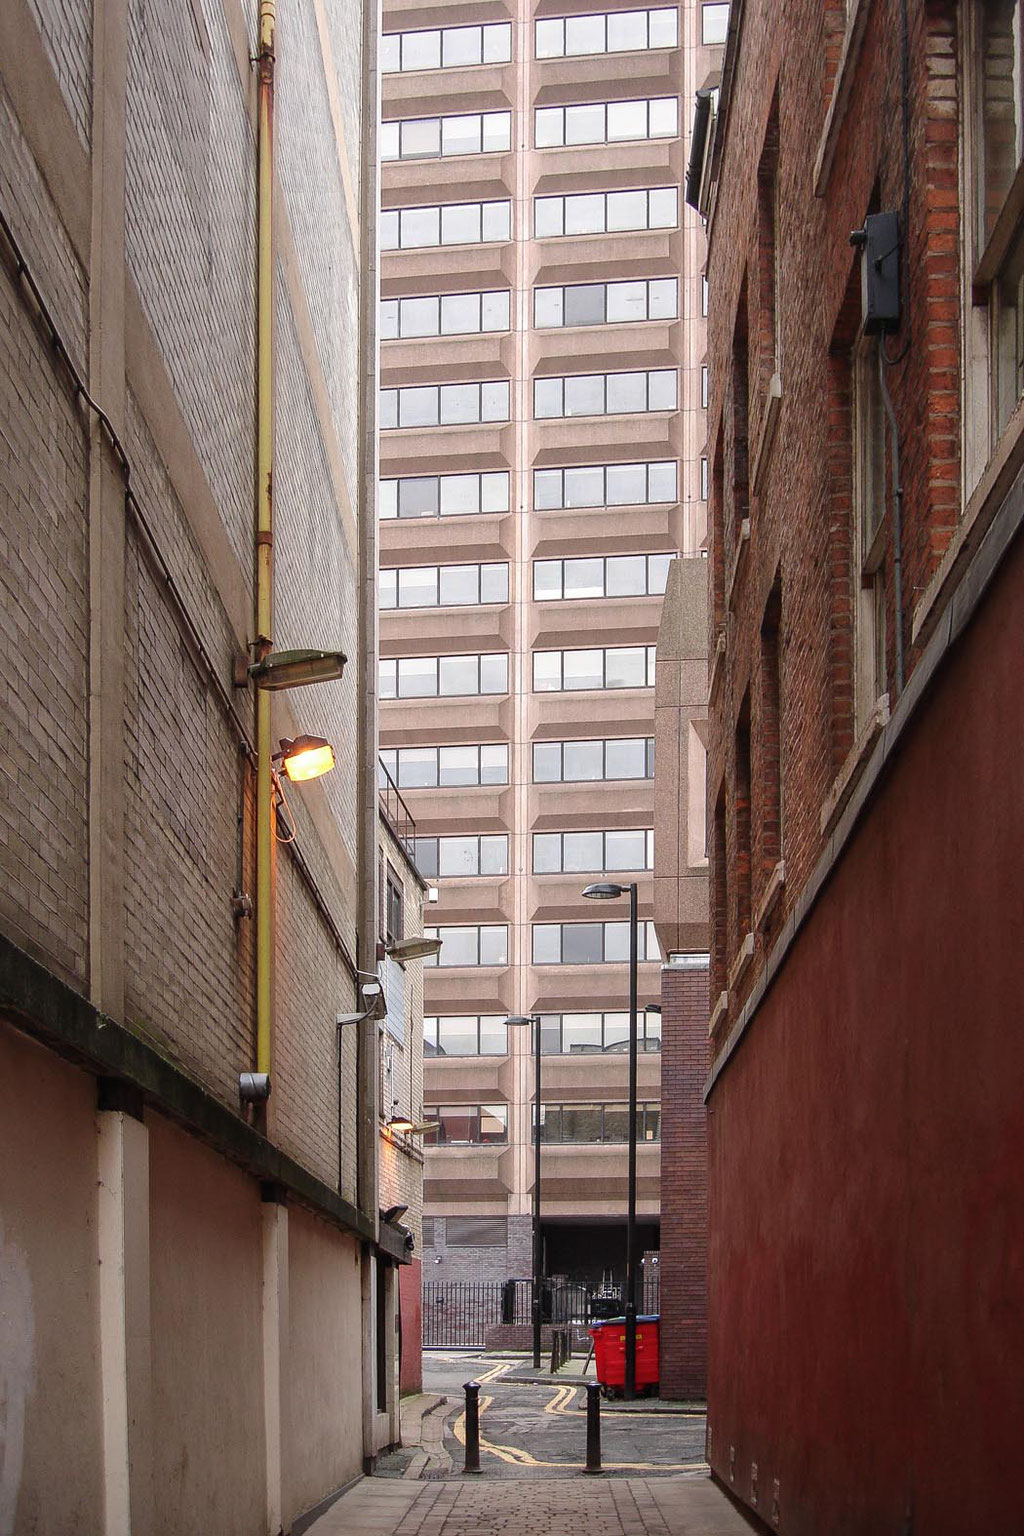 Lowry House (Robert Swift & Partners), Manchester (UK)